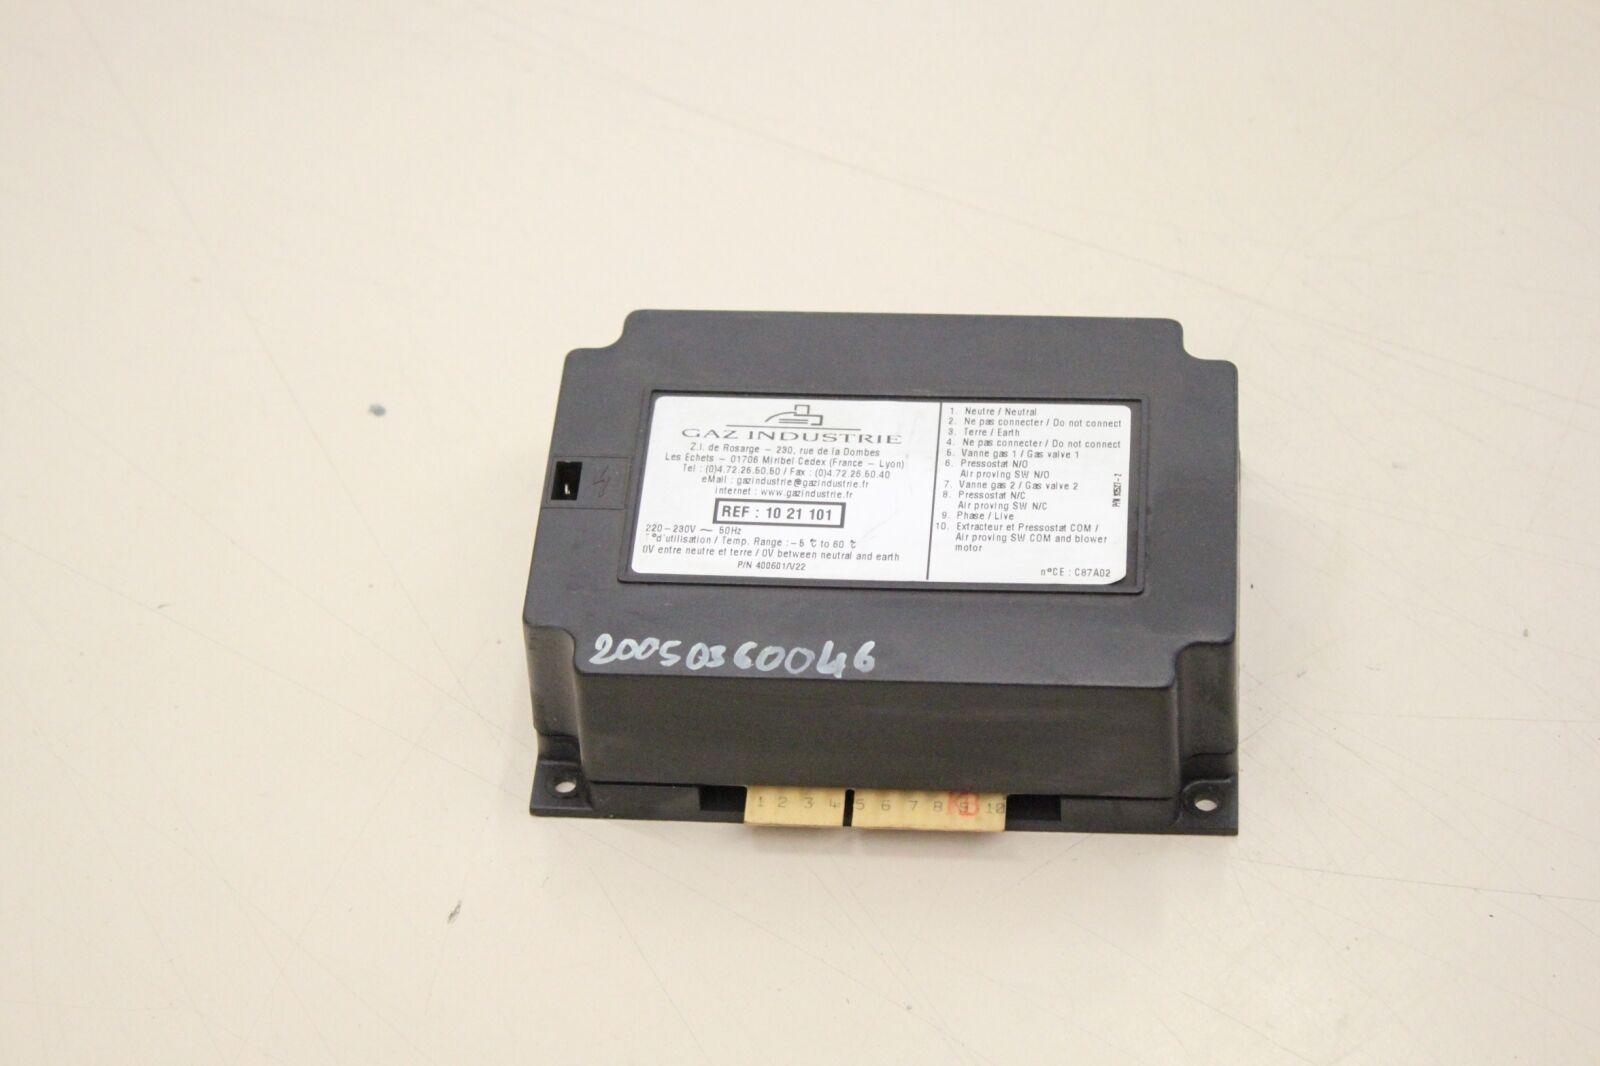 GAZ INDUSTRIE C87A02 400601/V22 1021101 Steuerung Modul 20050360046